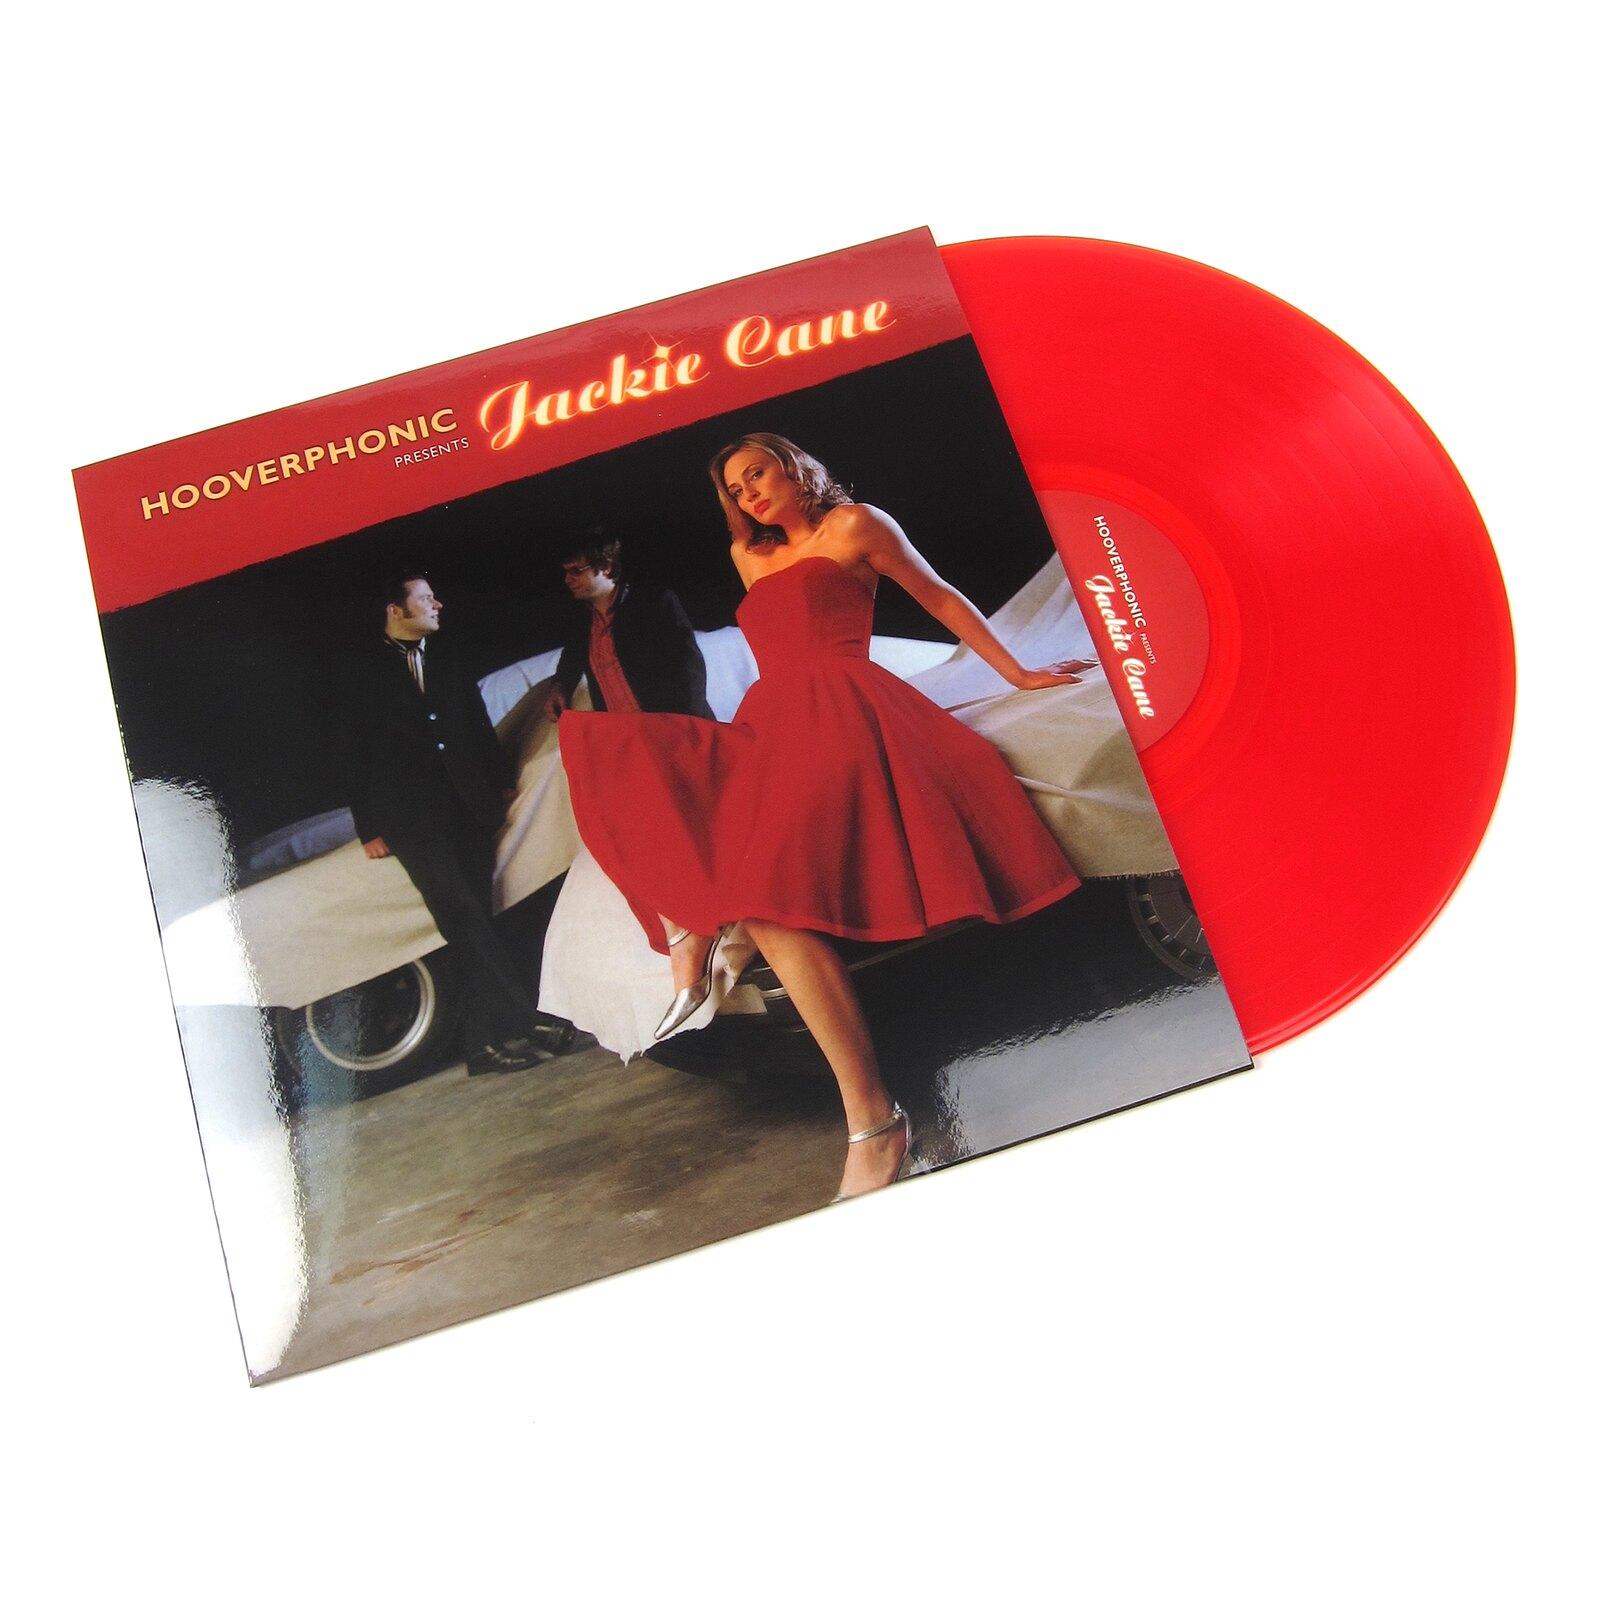 Hooverphonic - Jackie's Delirium [Ethnic Trip-Hop]